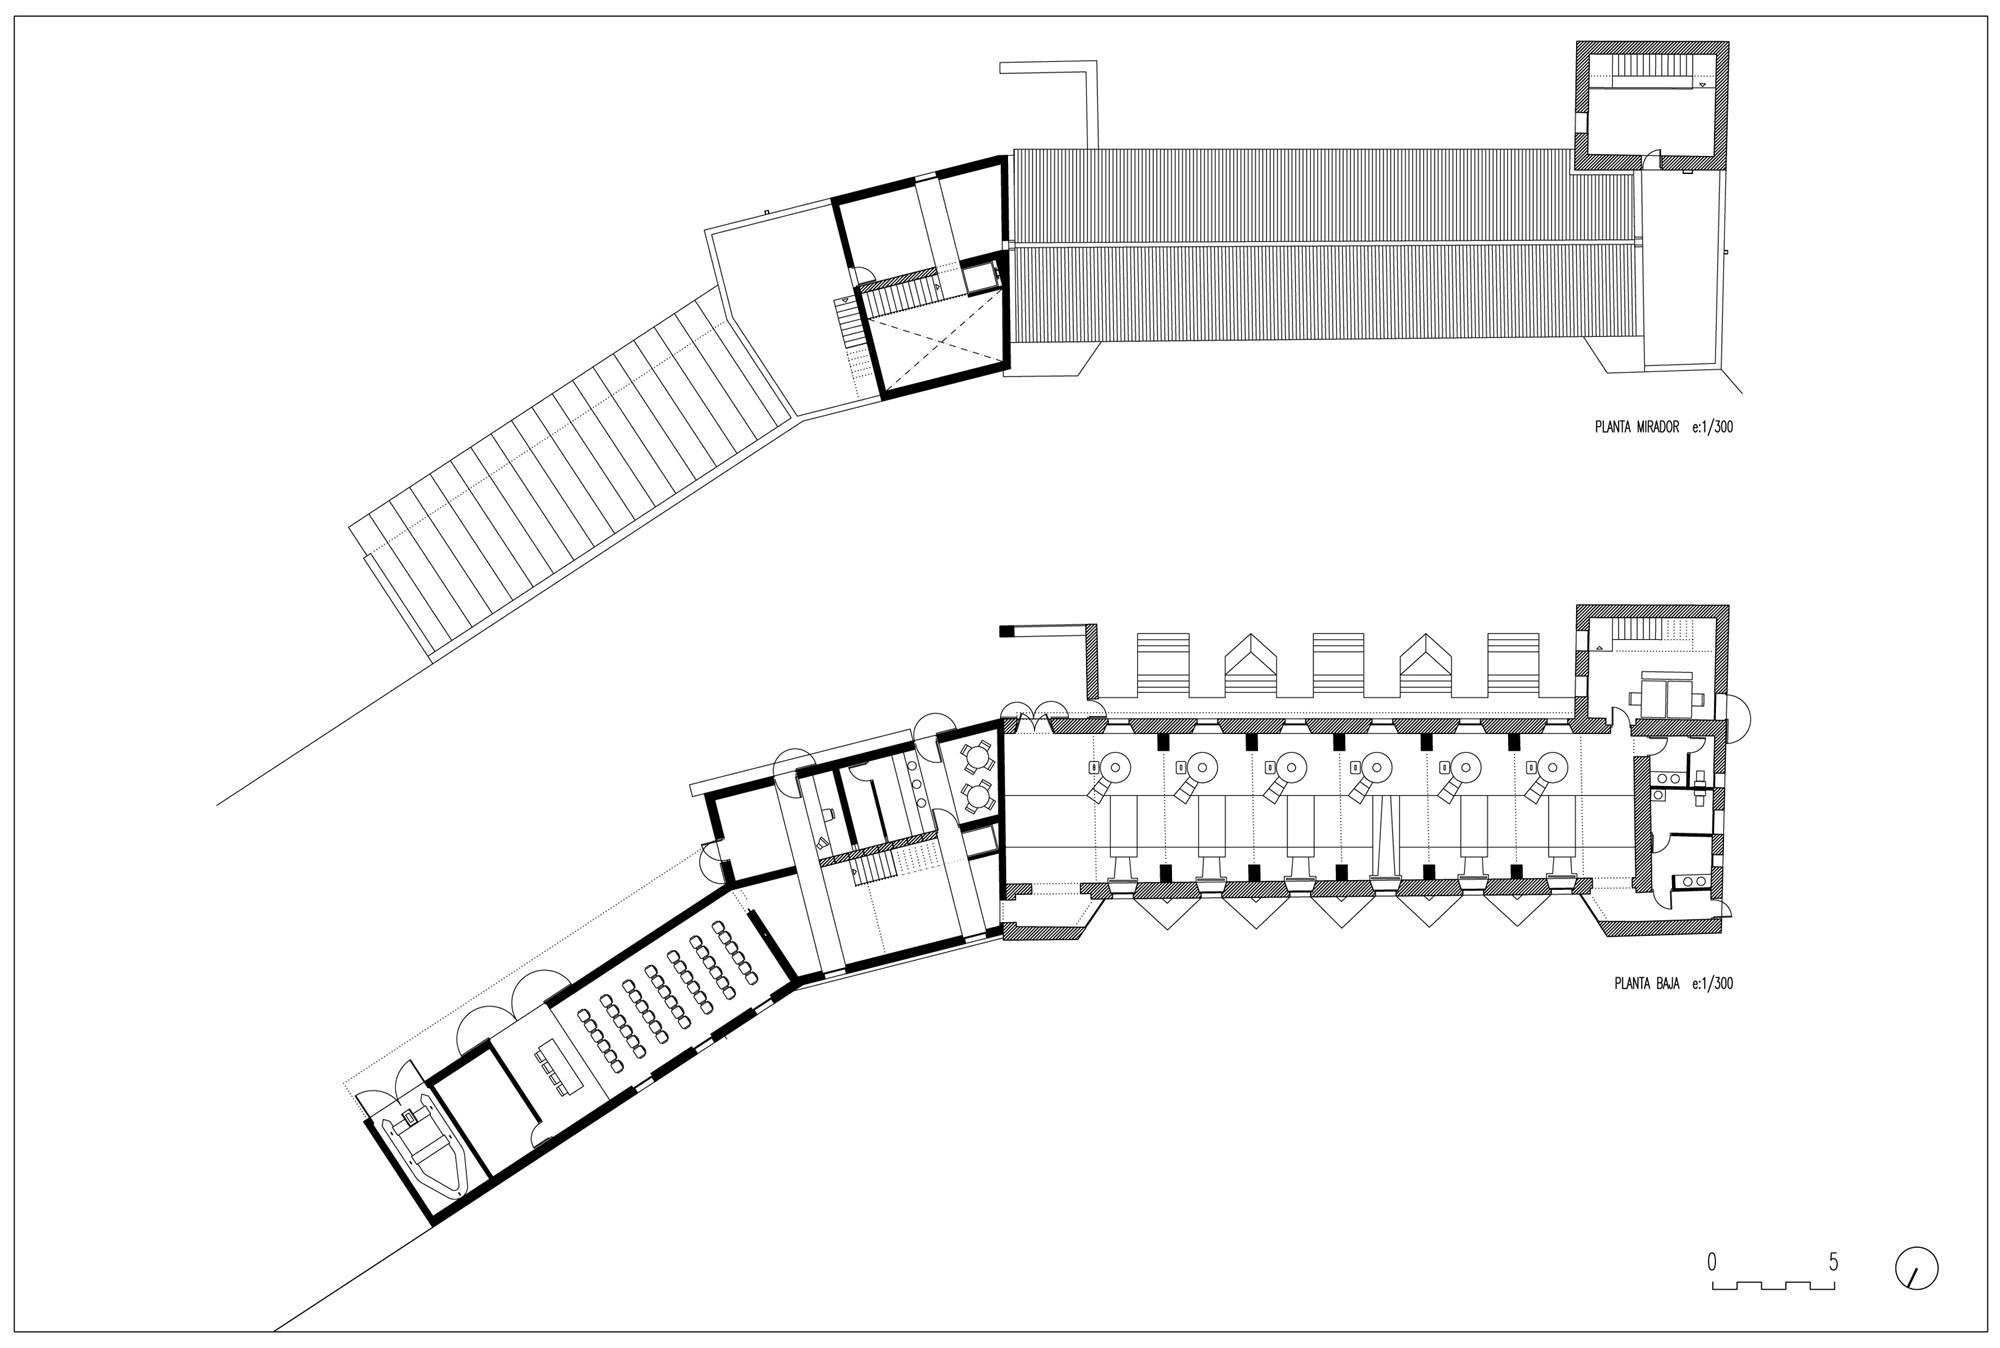 Proyecto de rehabilitaci n del molino mareal de el for Junta constructiva